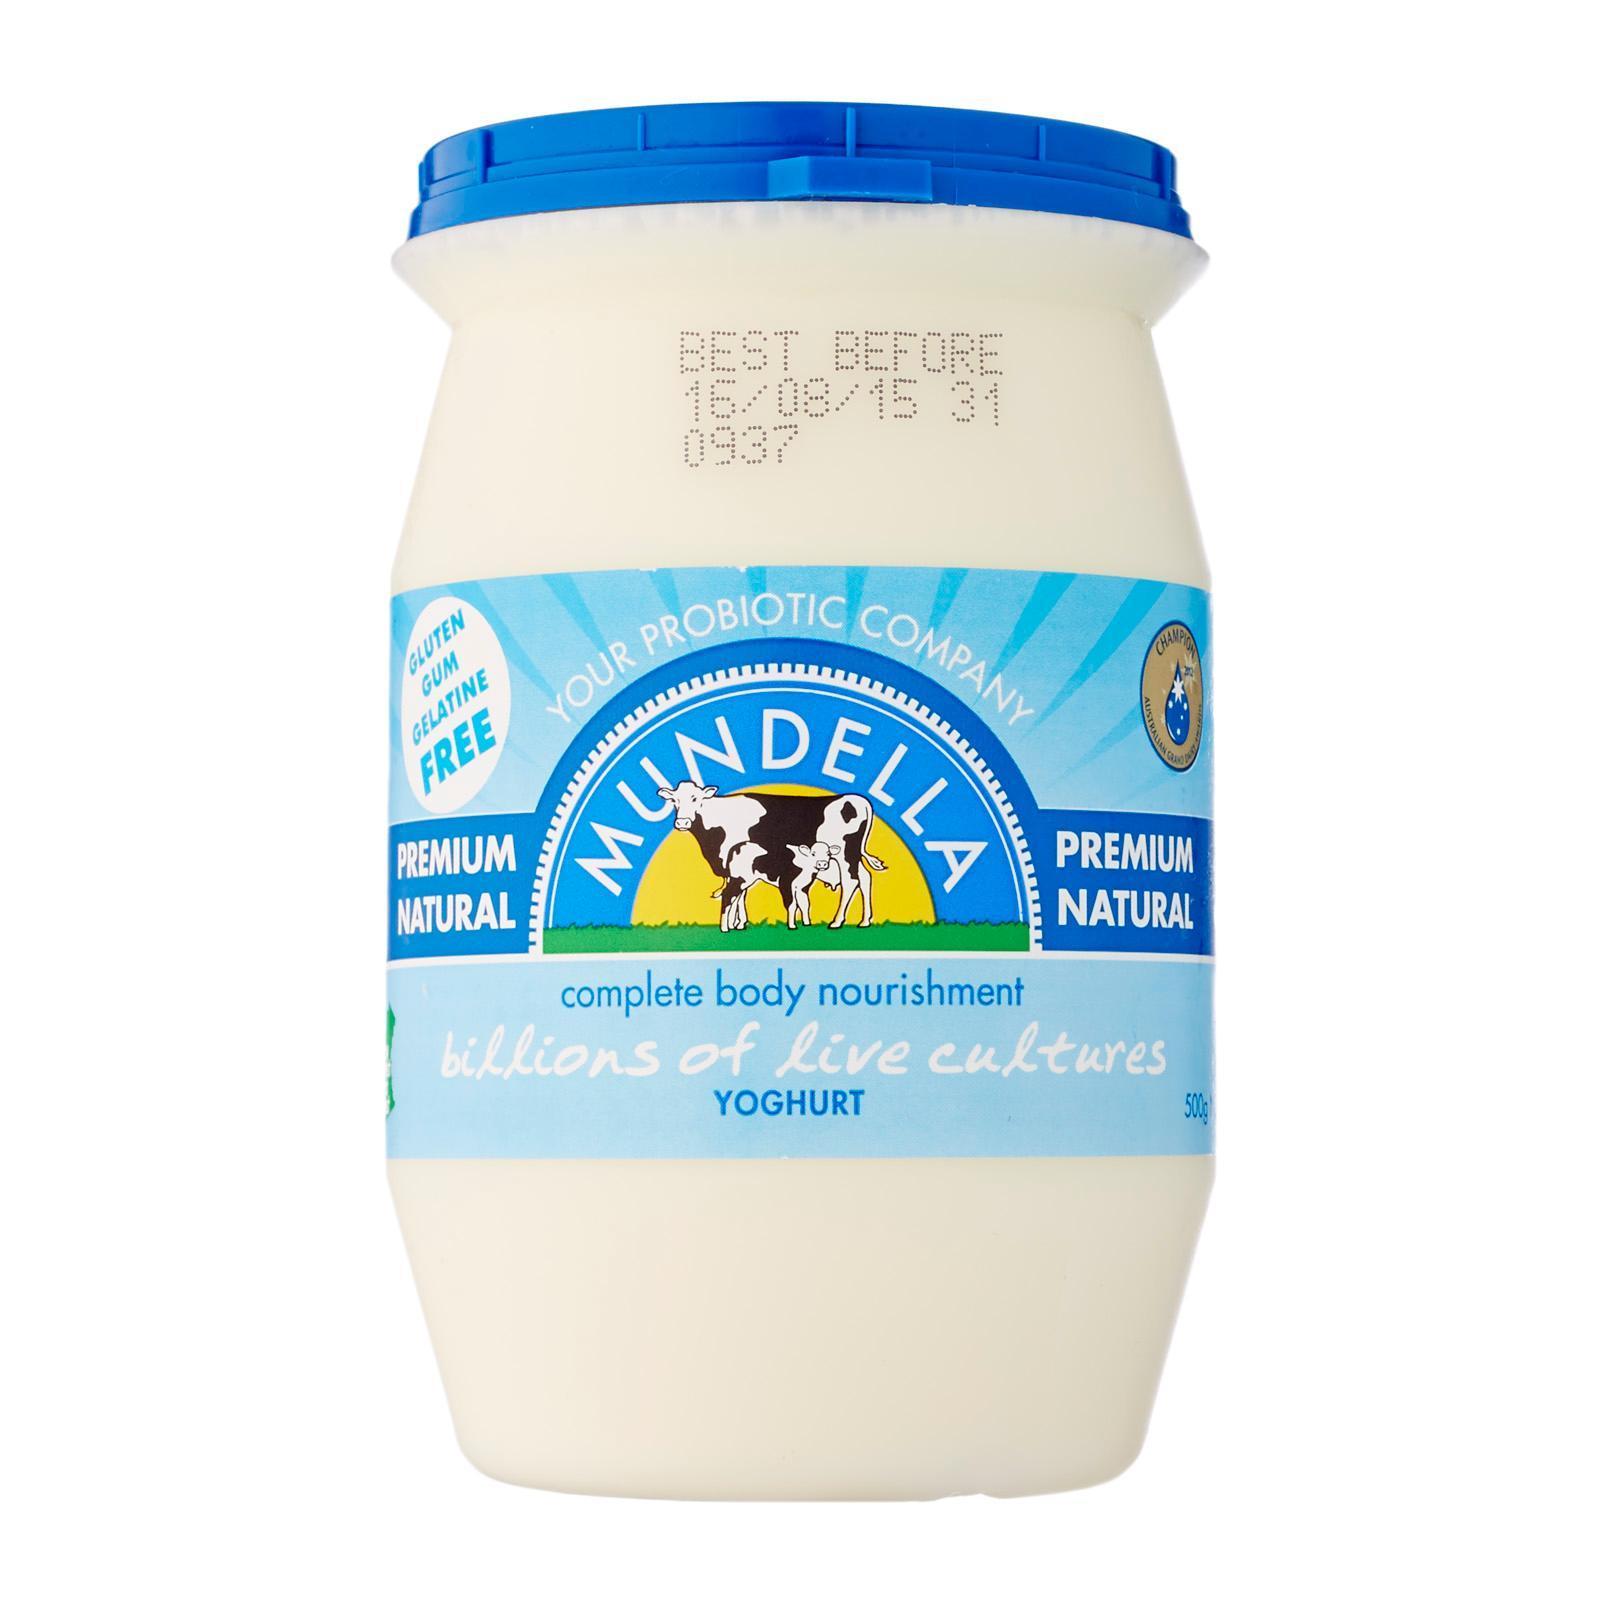 Mundella Premium Natural Yoghurt